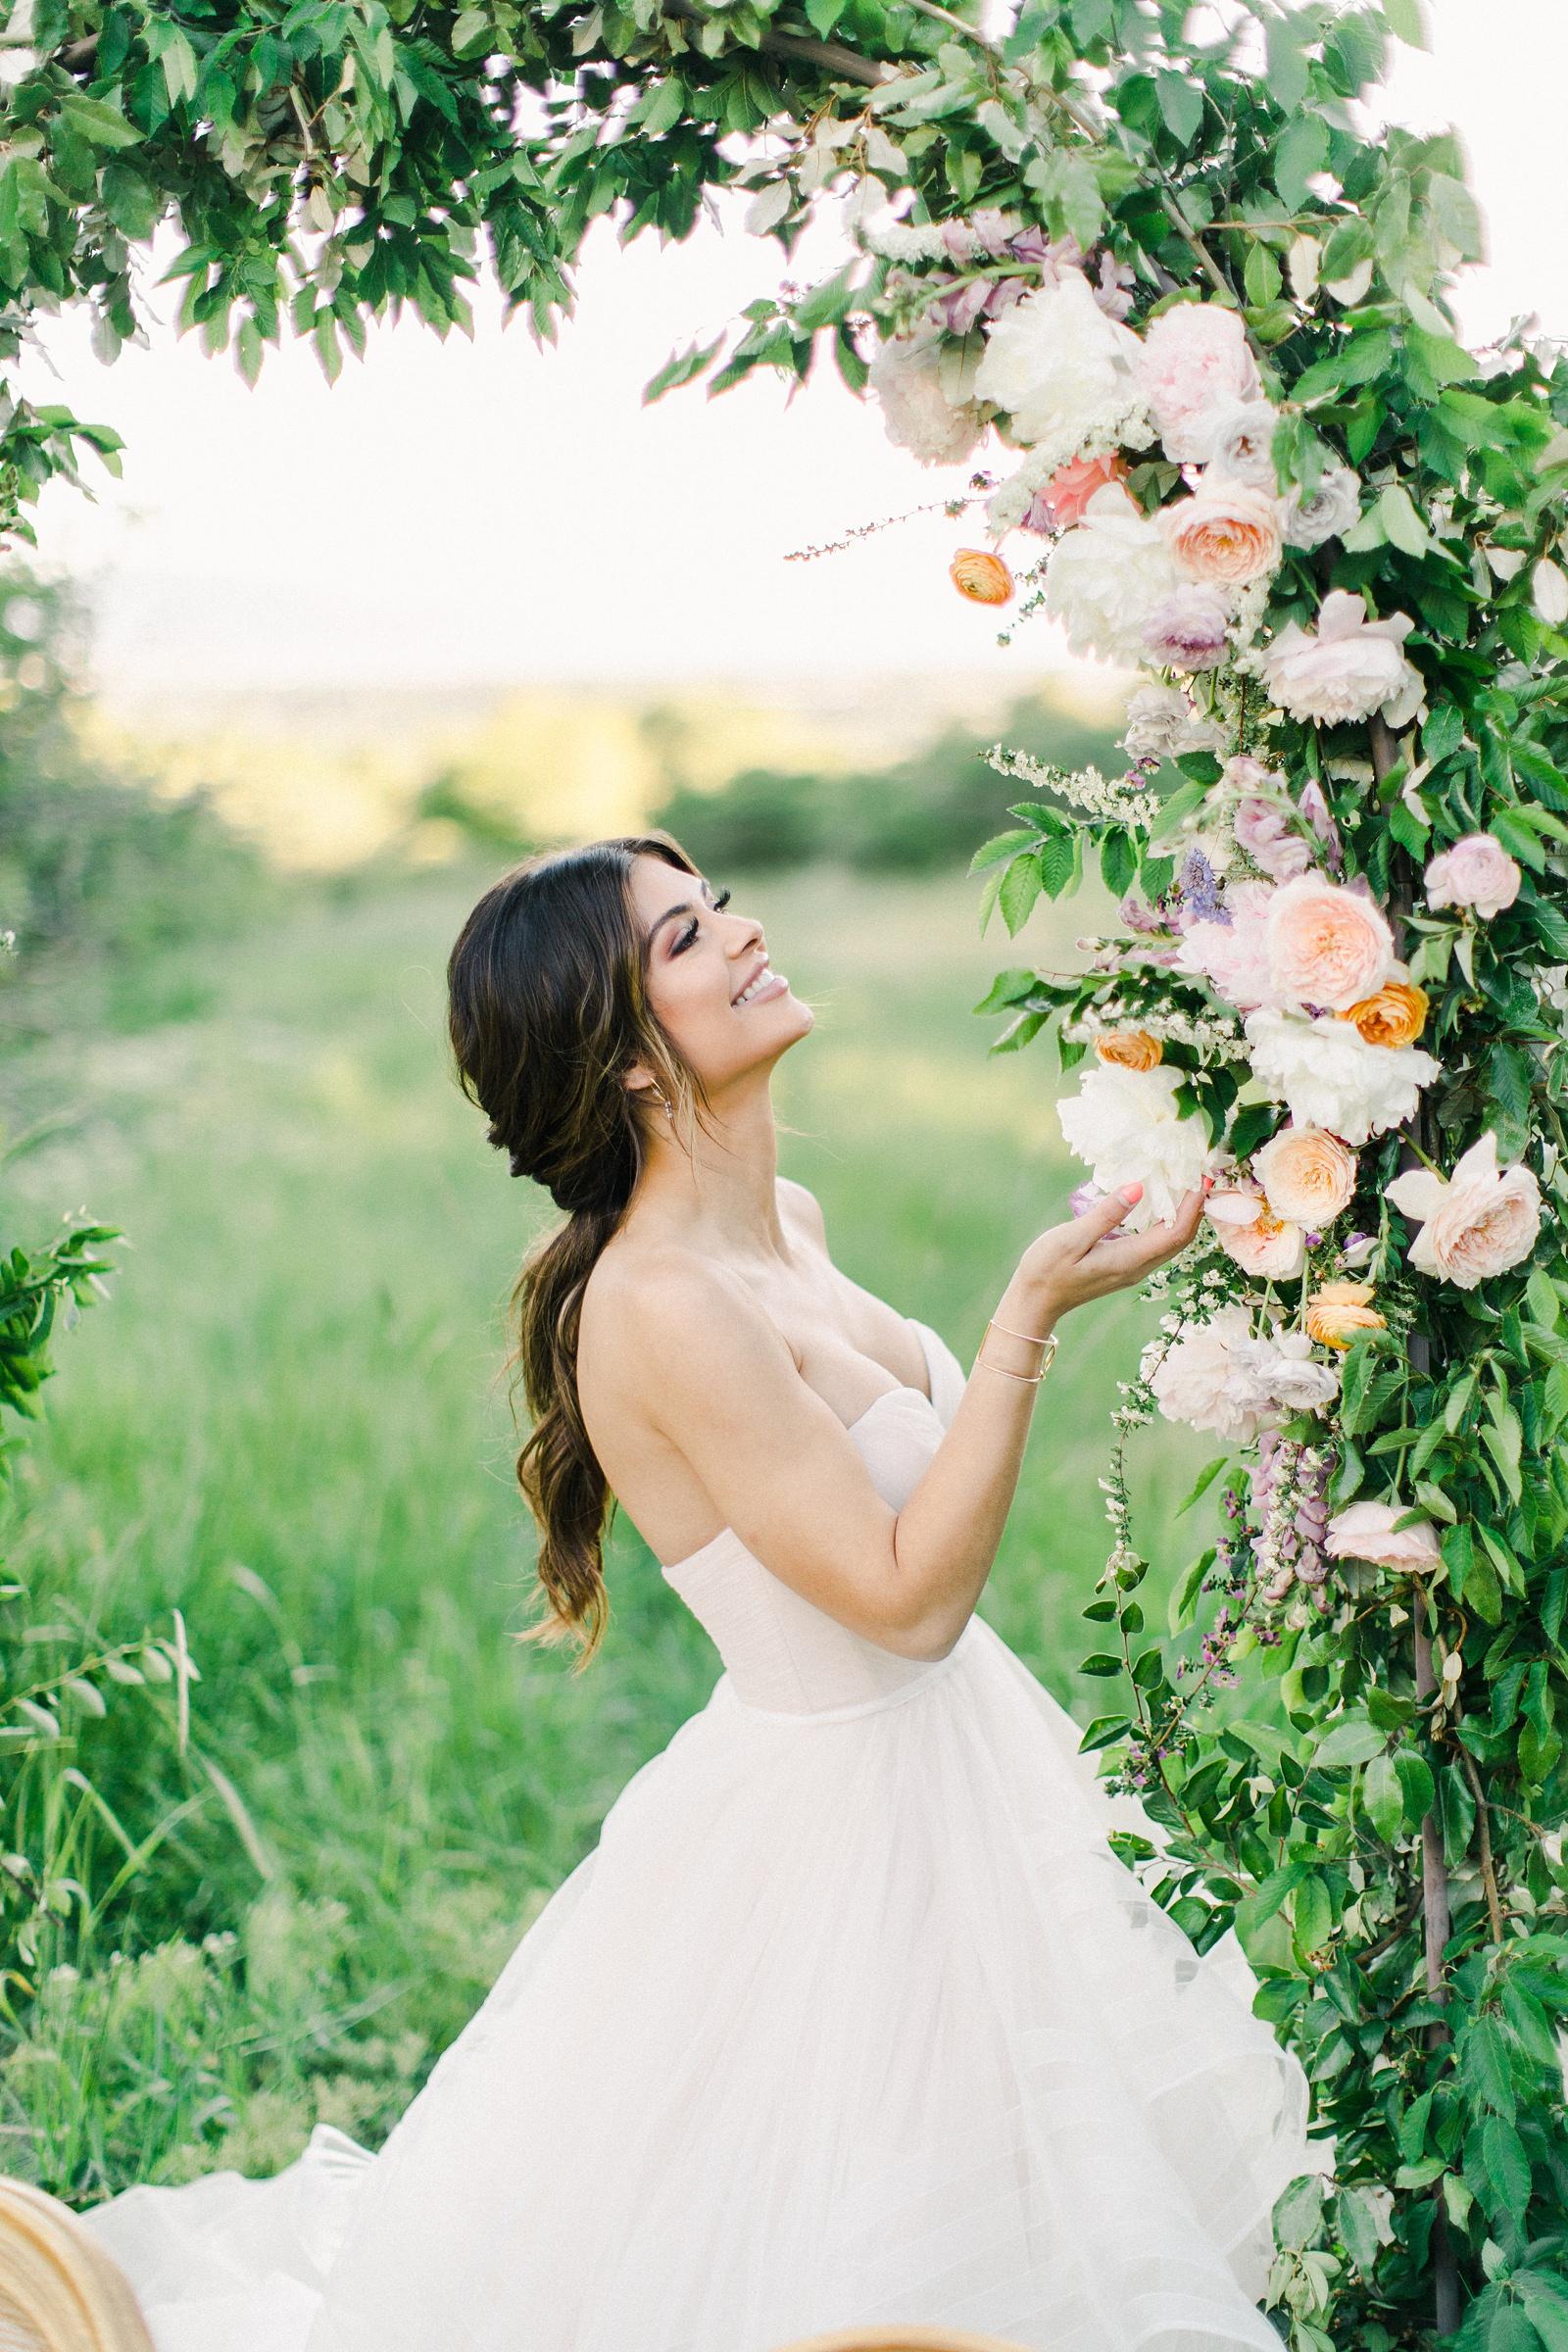 Outdoor Spring Secret Garden Wedding, Provo Utah Film Wedding Photography, floral arch wedding flowers, bride wearing BHLDN wedding dress with sweetheart neckline